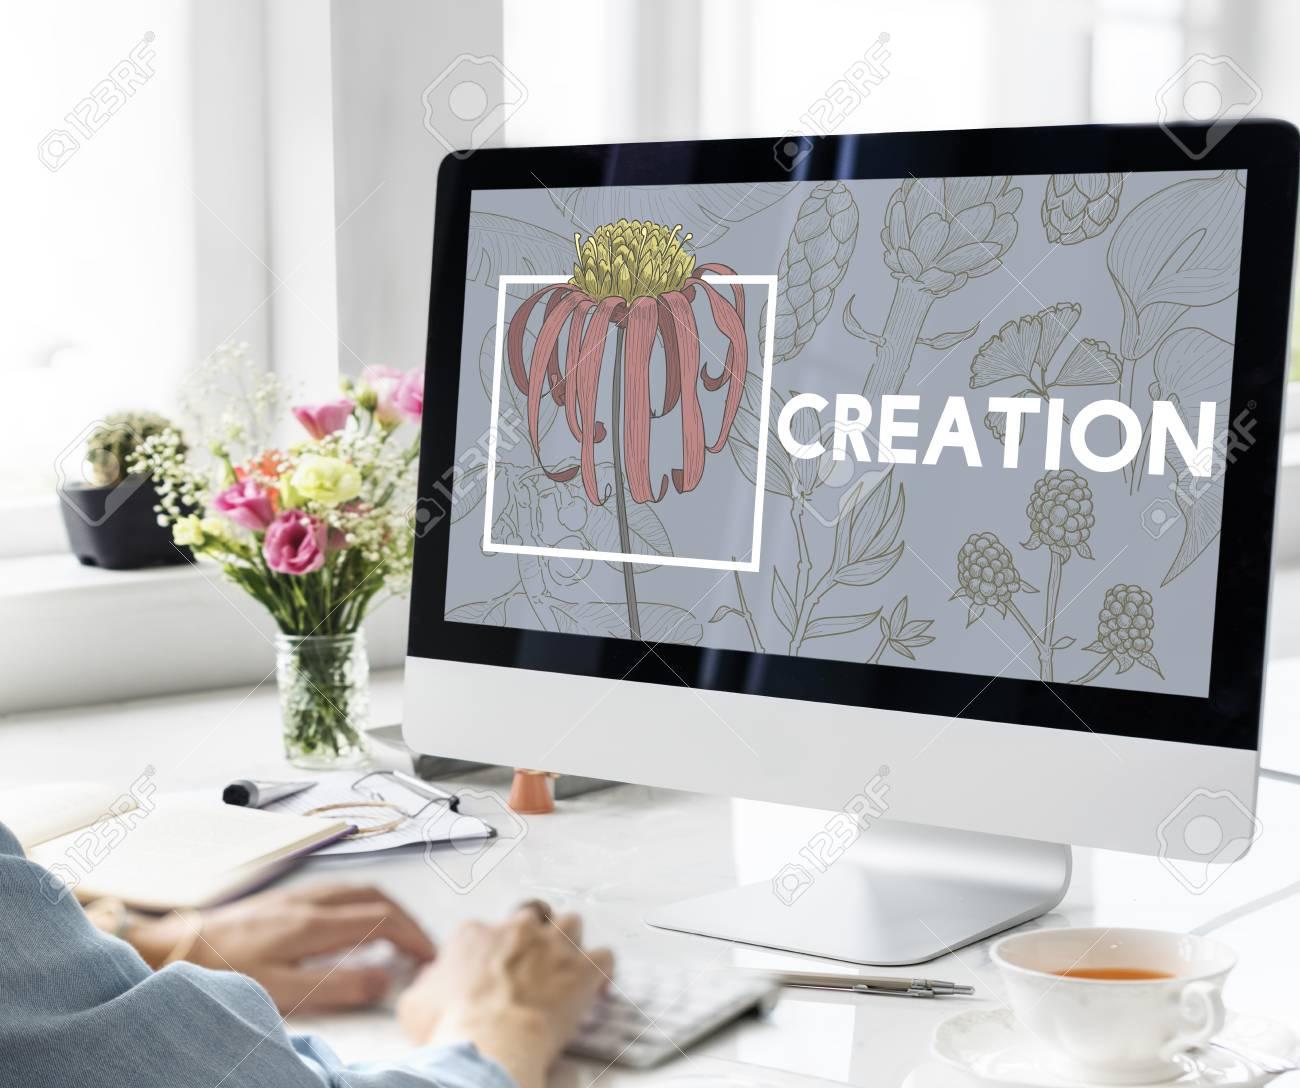 Design Creation Leisure Hobby Ideas Objective Stock Photo - 75097261